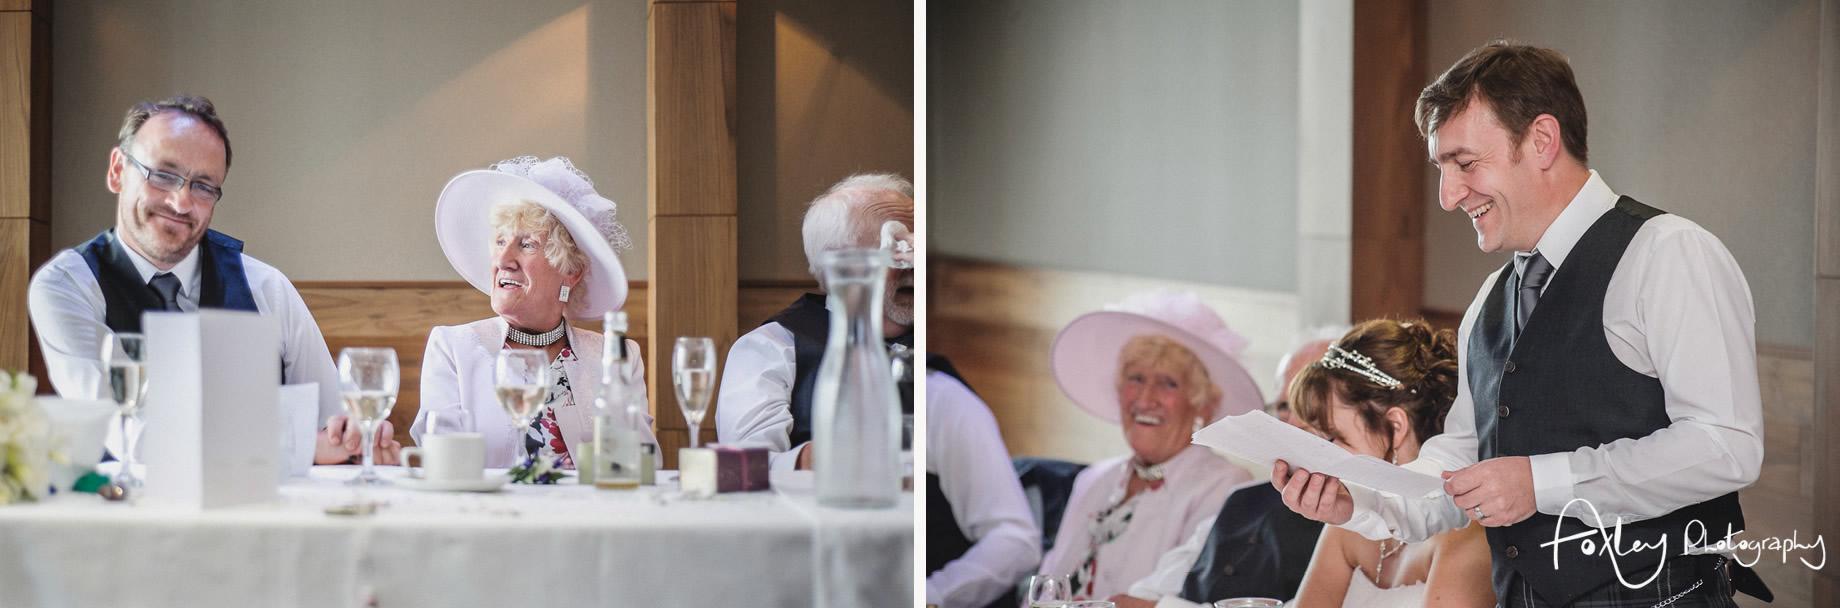 Alys-And-Davids-Wedding-Loch-Lomond-144